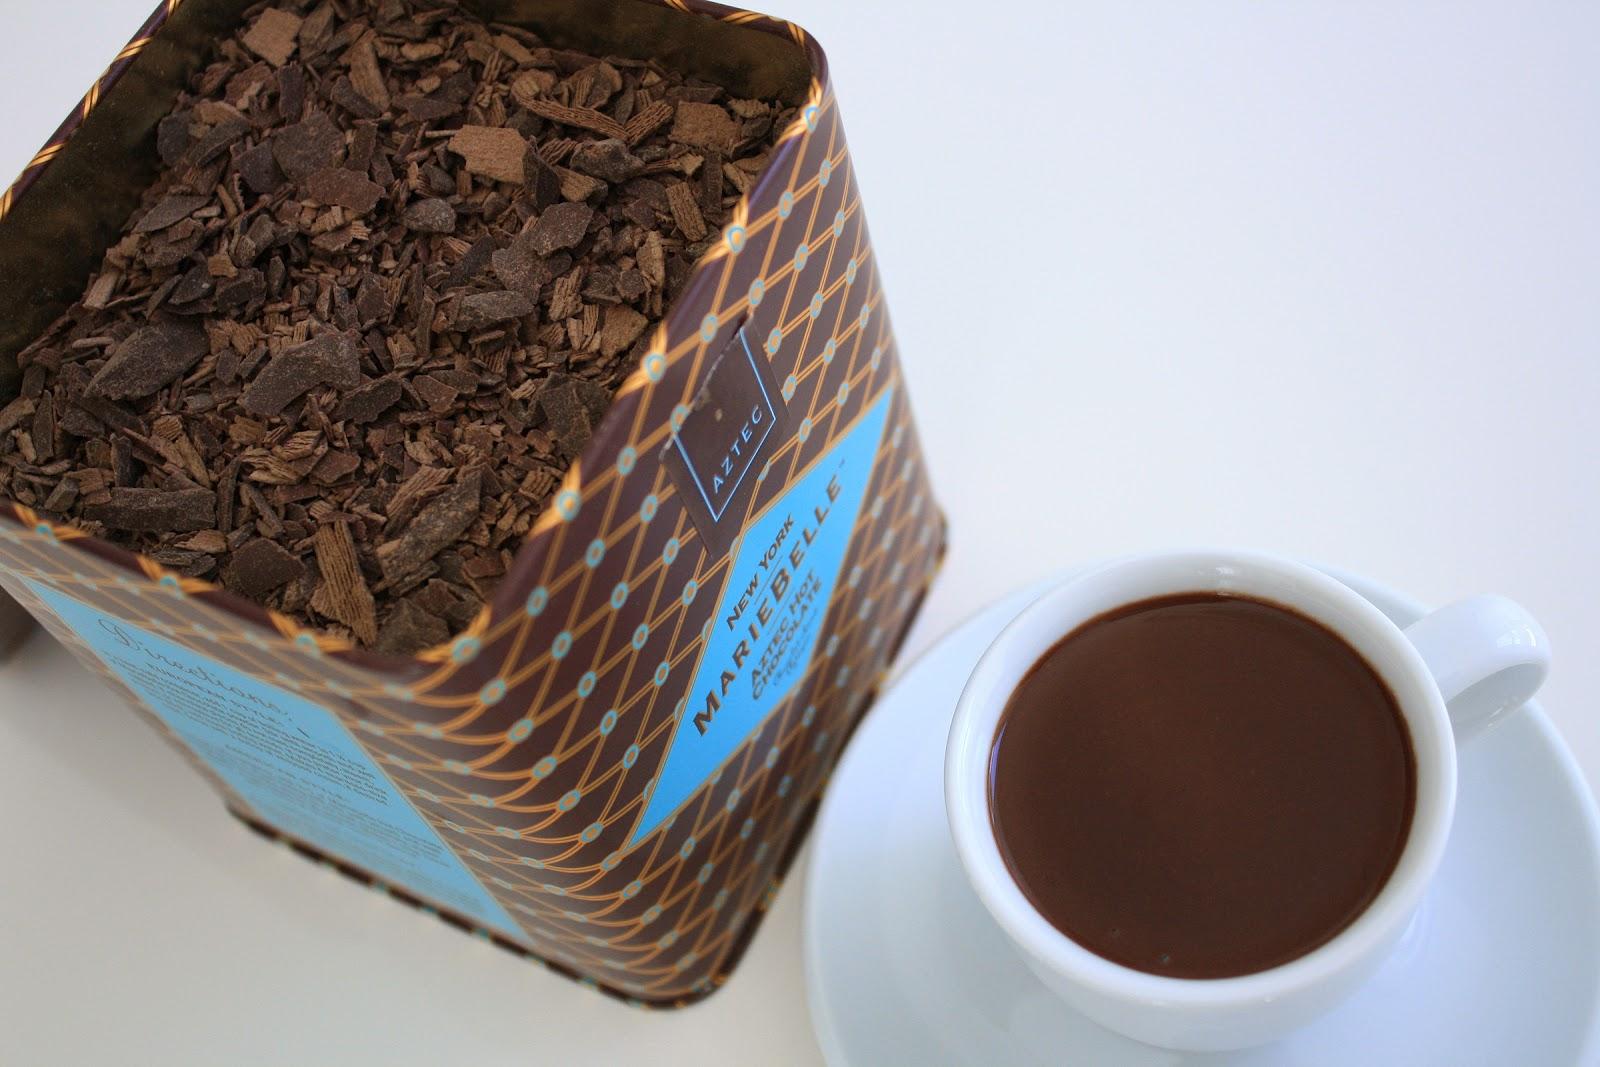 MarieBelle Hot Chocolate